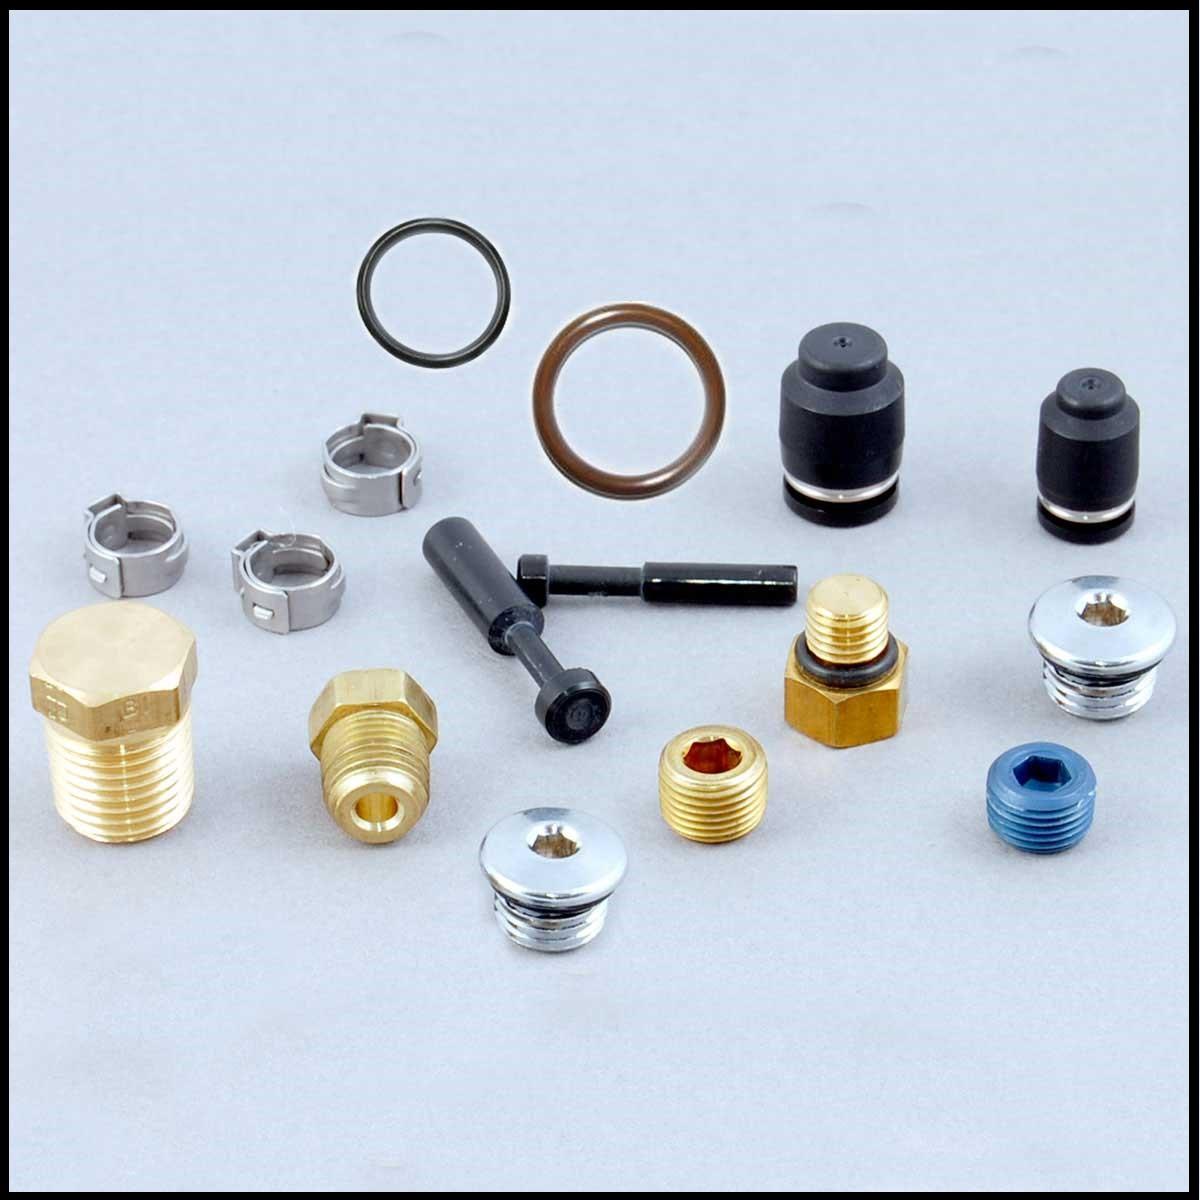 Clamps, O-Rings, Caps & Plugs